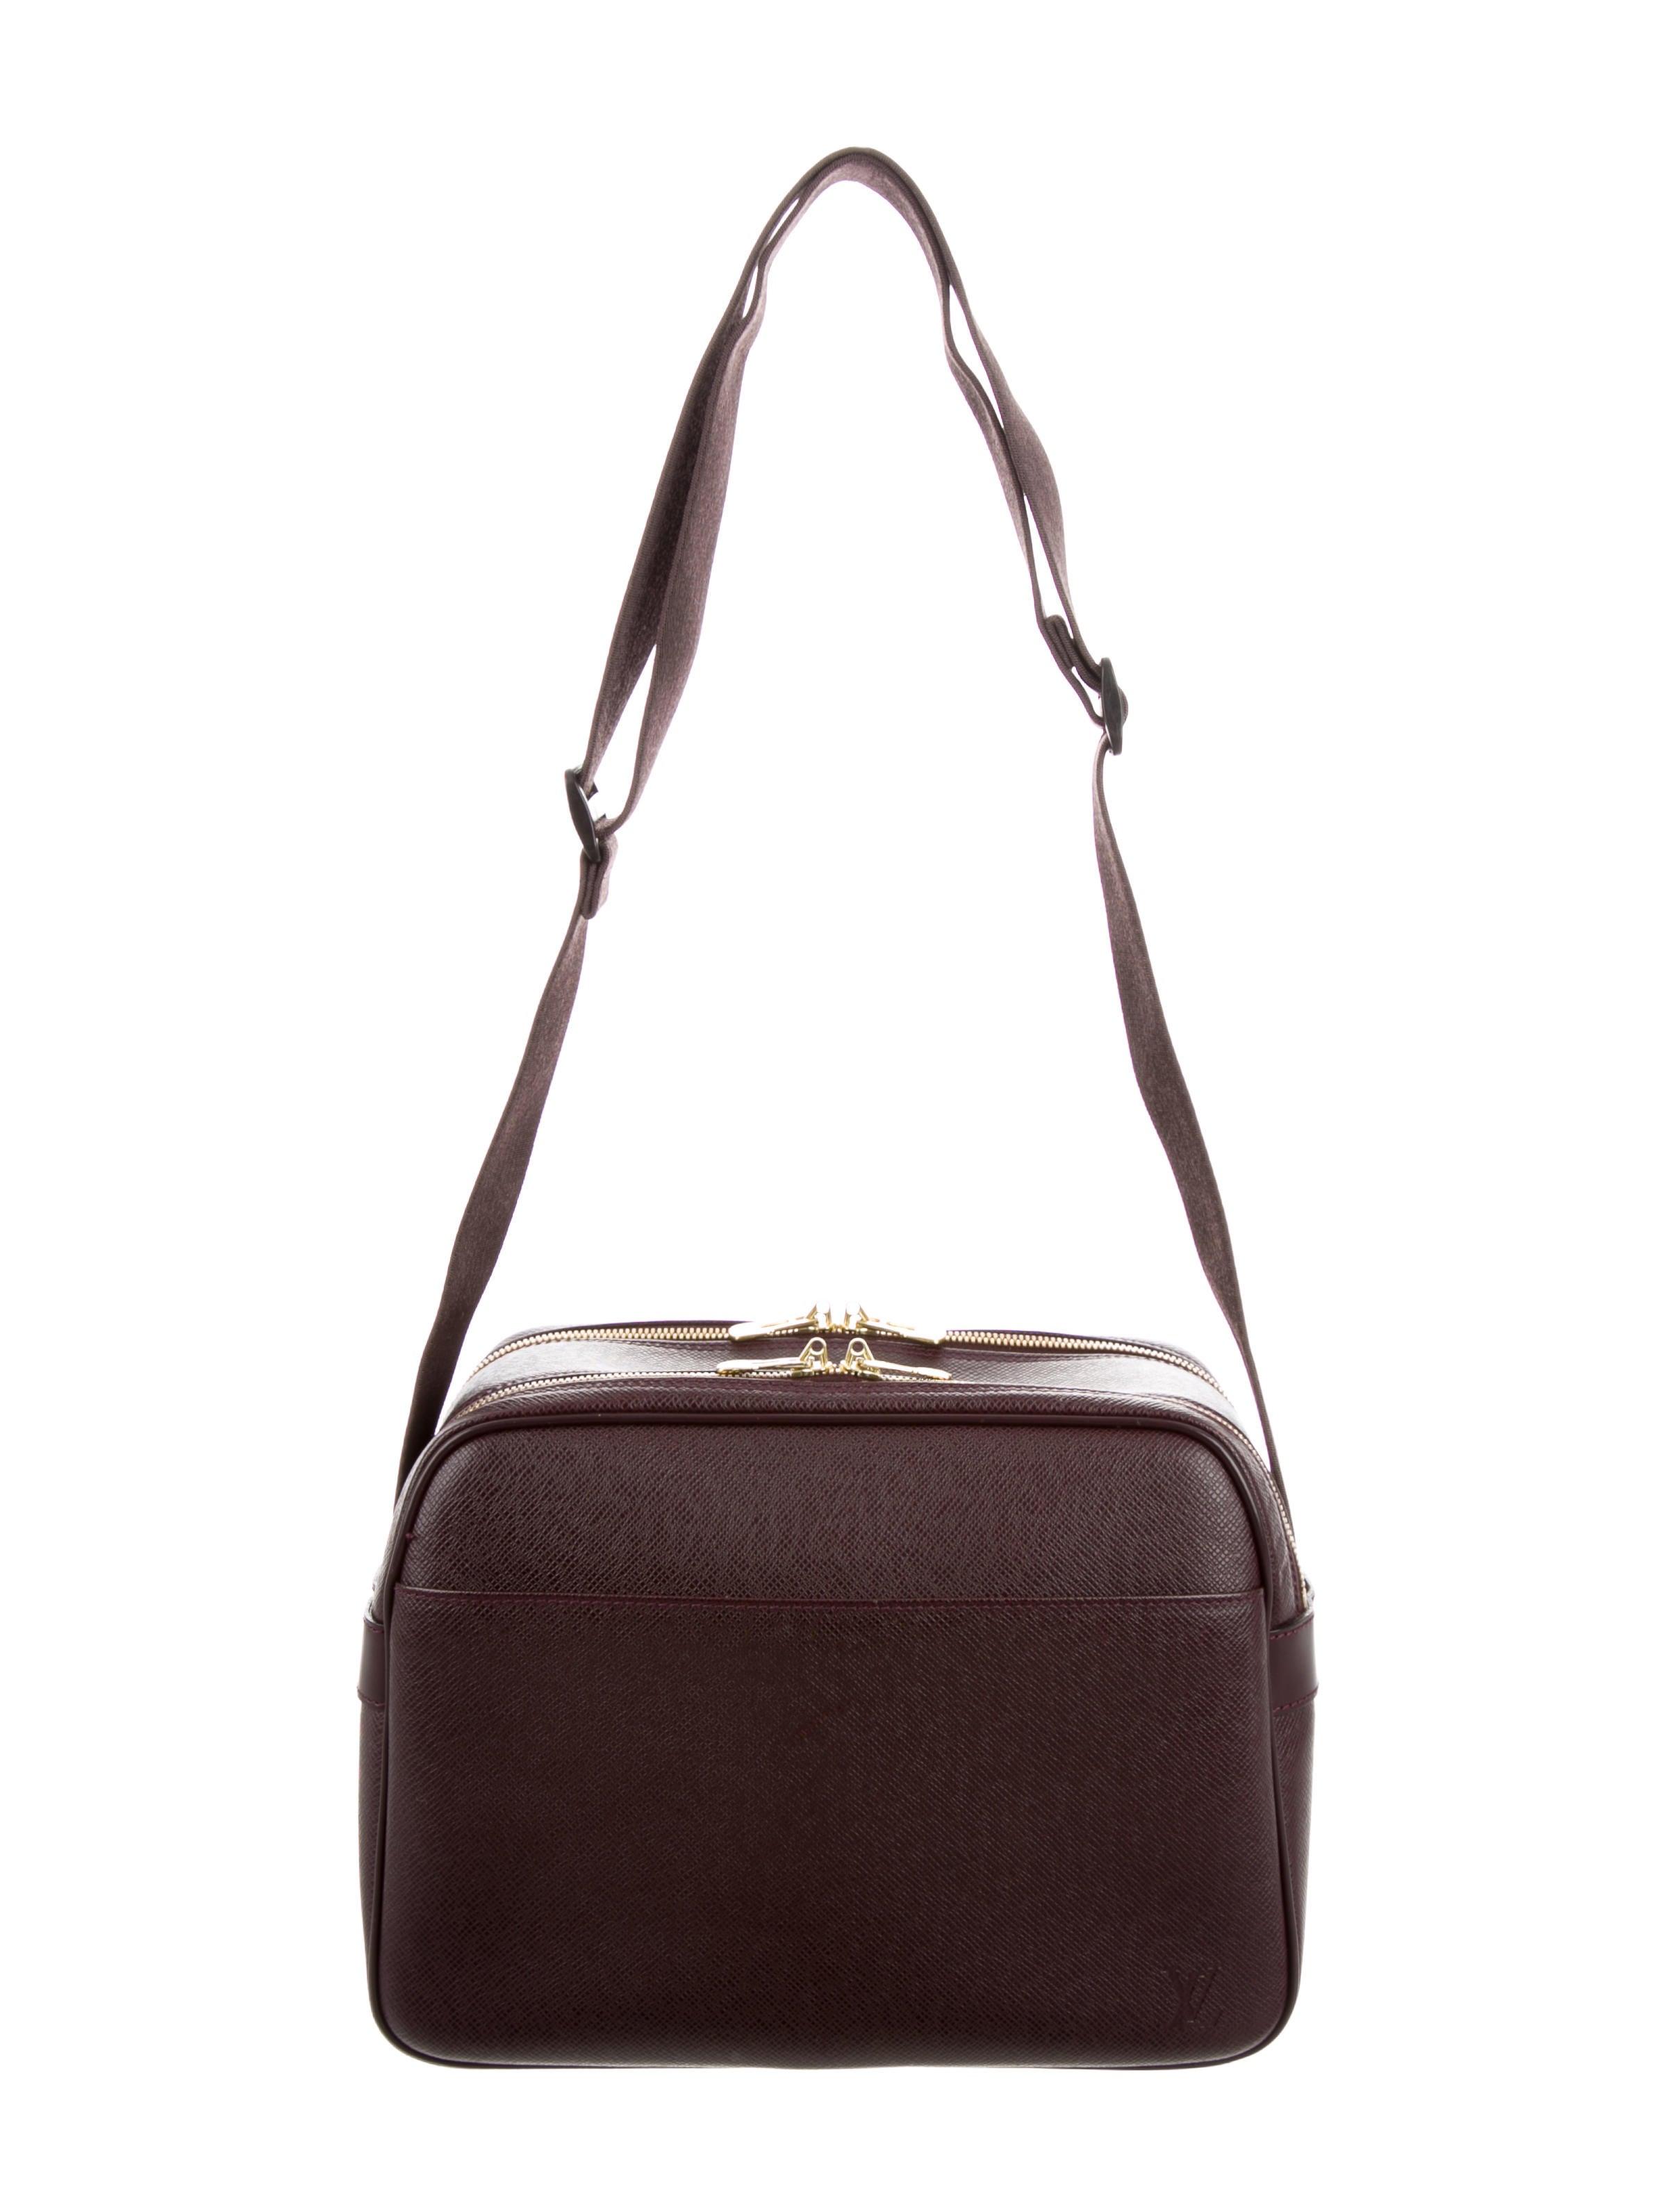 d89c2afddc8 Louis Vuitton Taiga Reporter PM - Bags - LOU101451